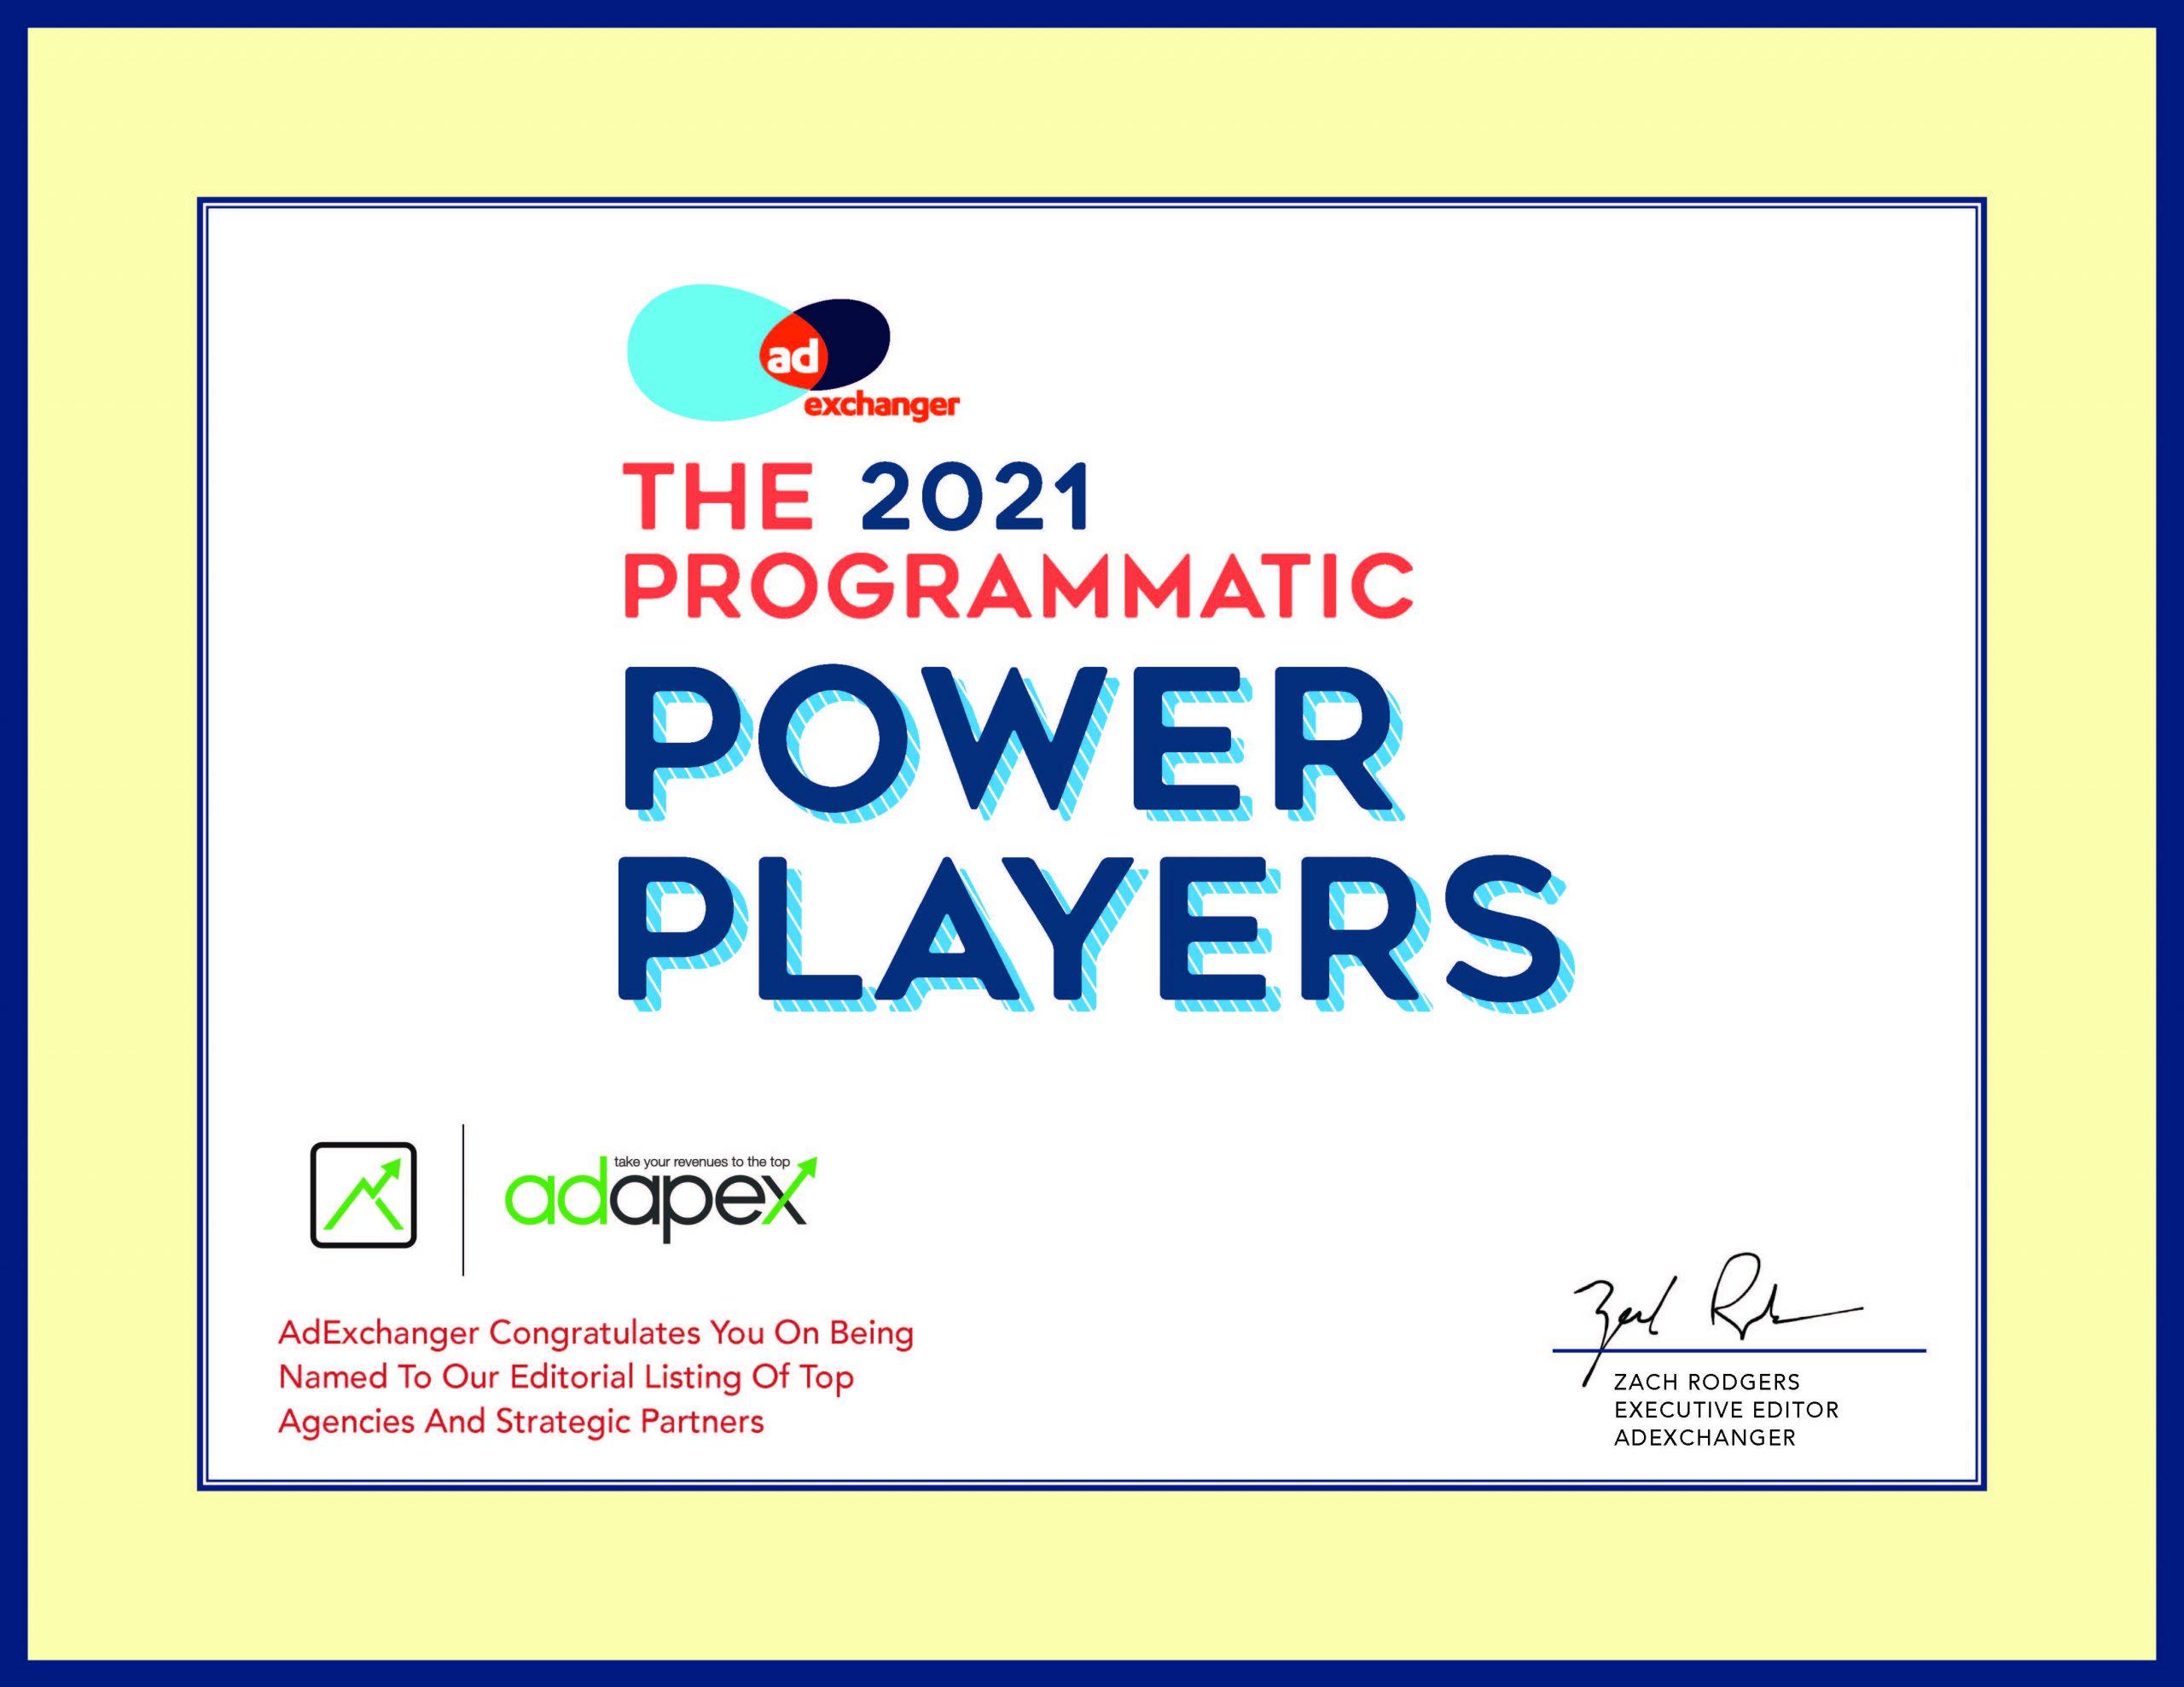 Adapex Power Player